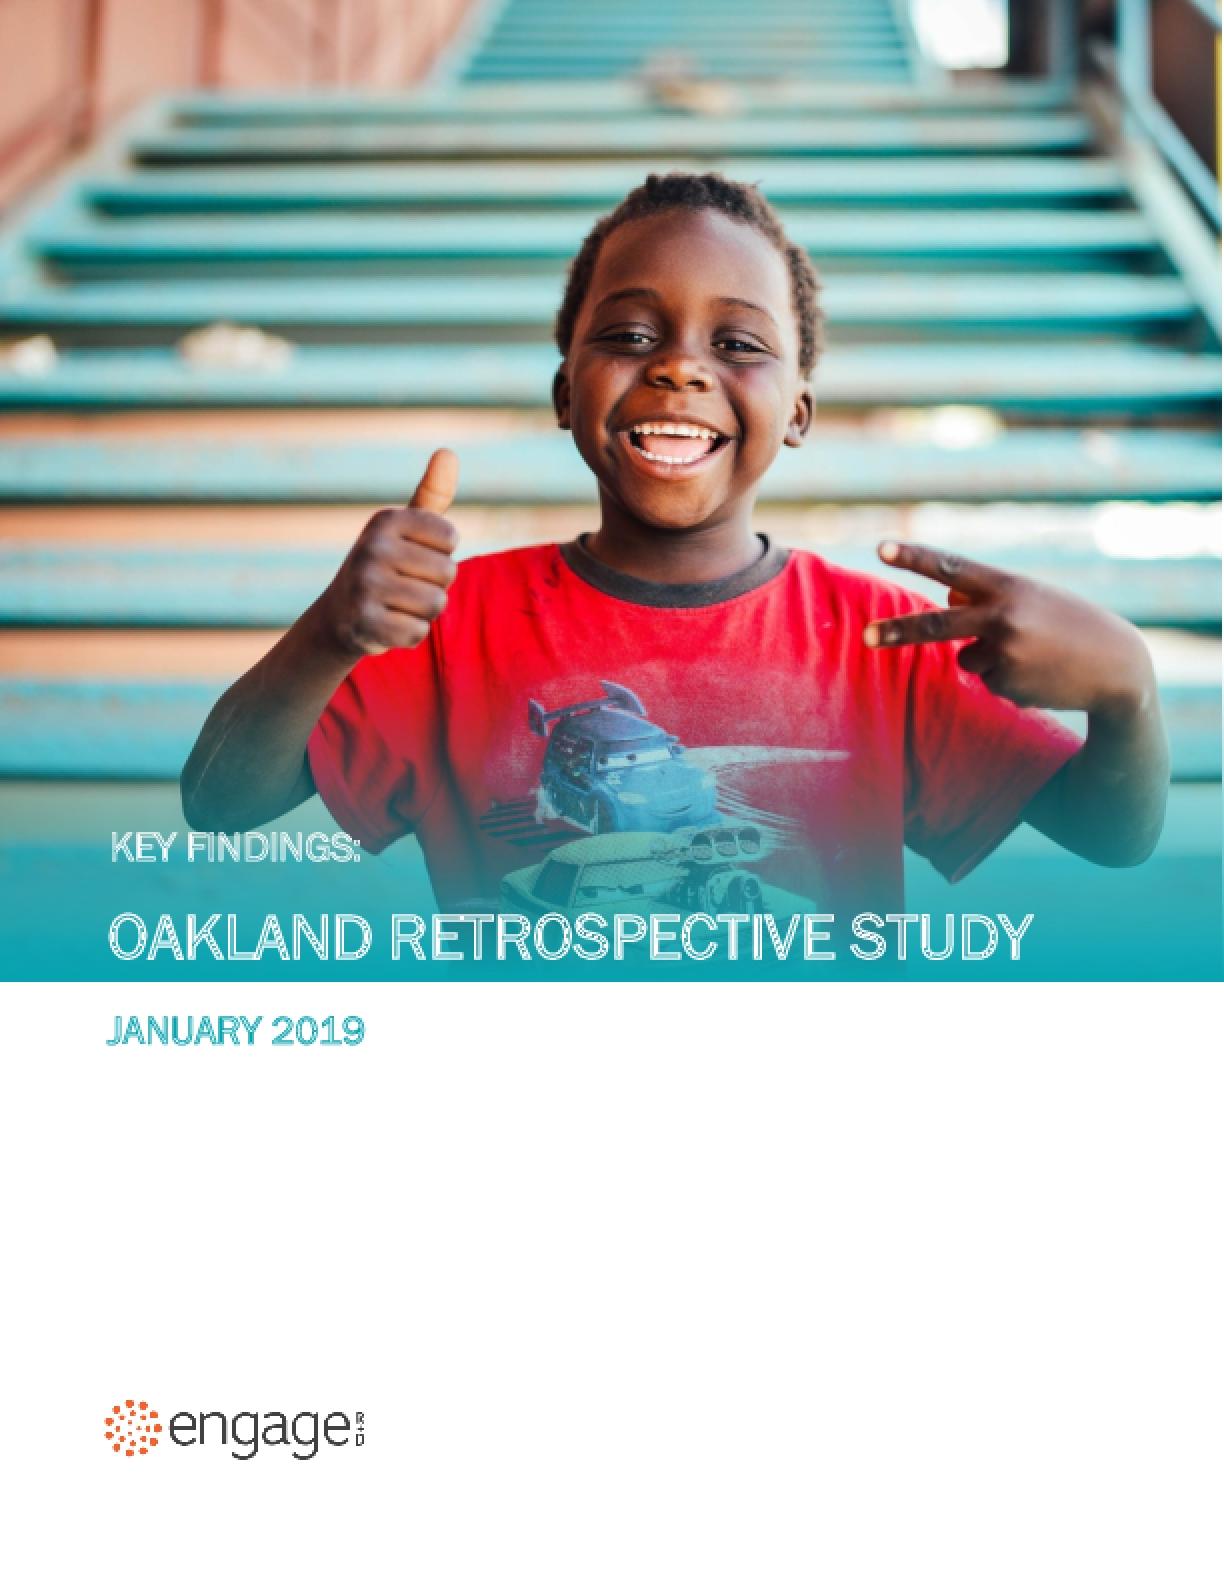 Key Findings: Oakland Retrospective Study